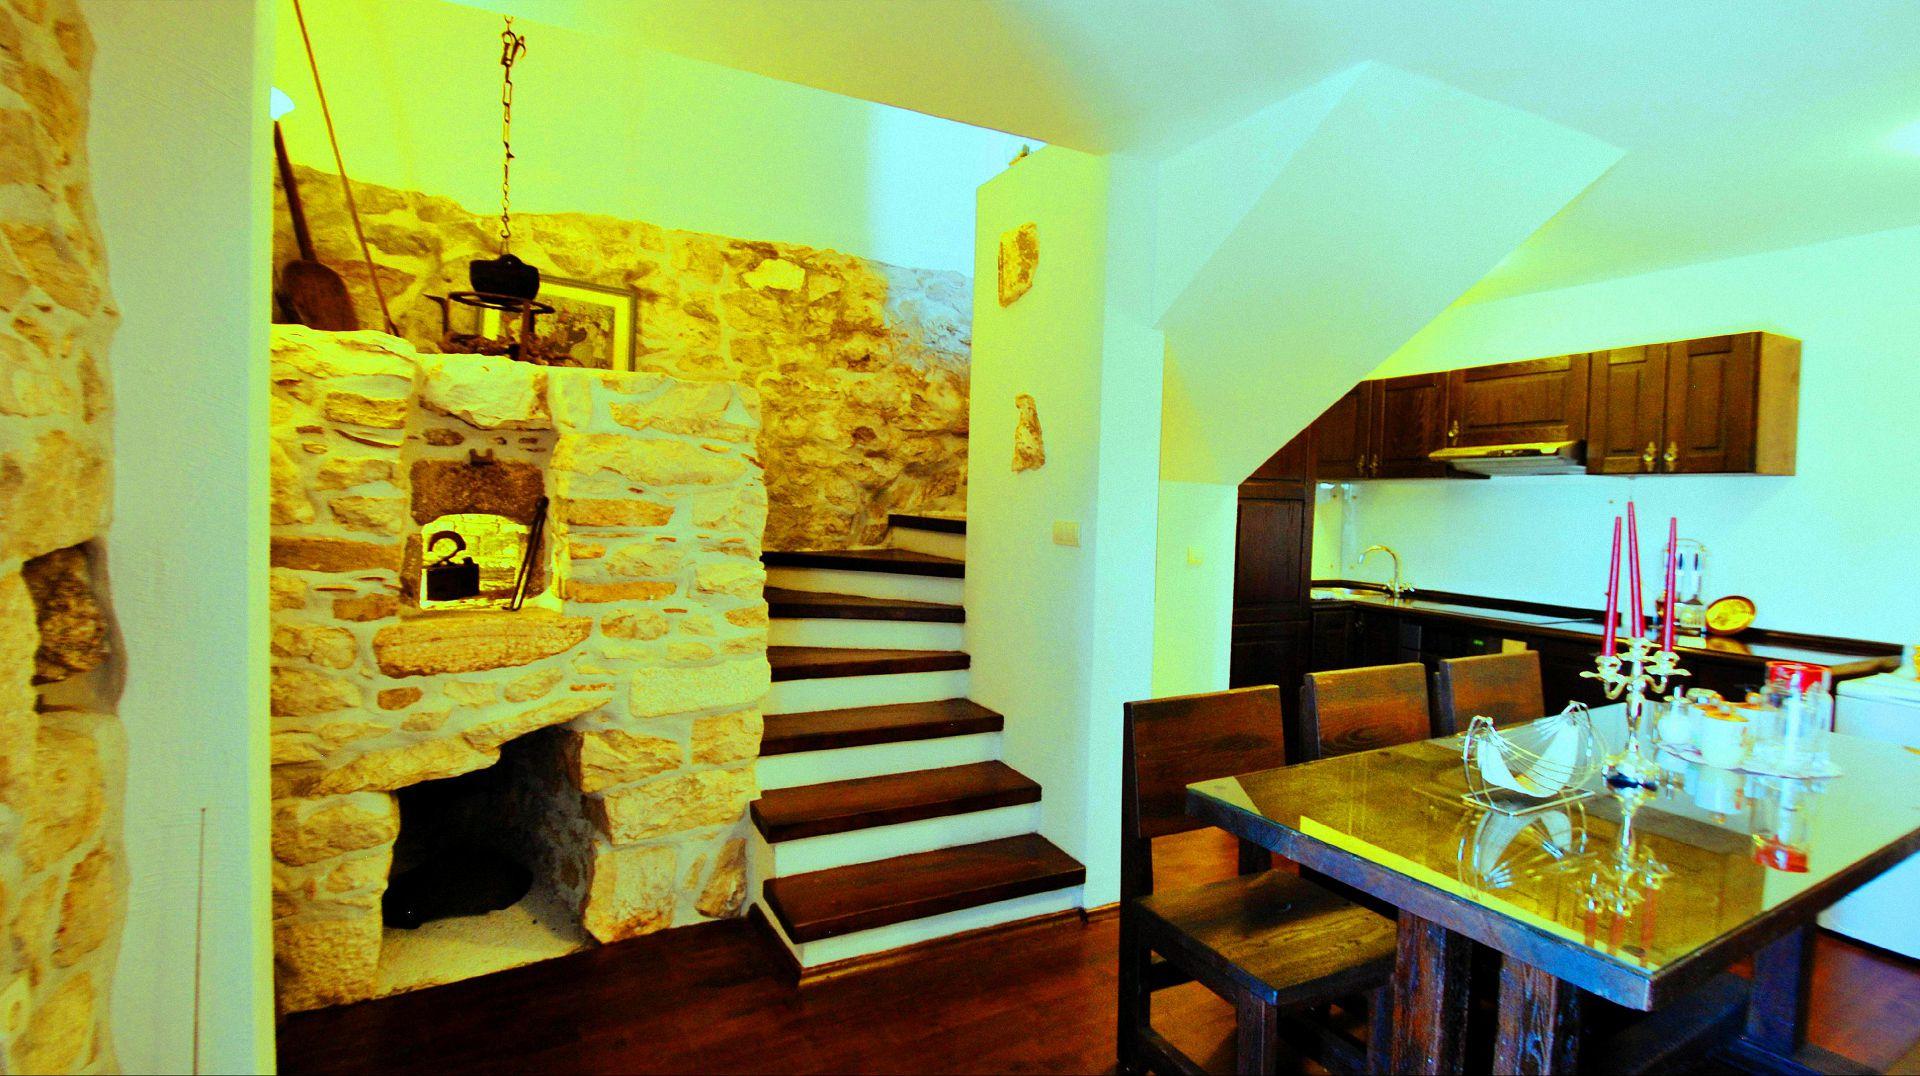 Vila Holiday house Marija - with pool: Duboka, Riviera Dubrovnik 52905, Duboka, , Rajoni i Splitit/Dalmacisë